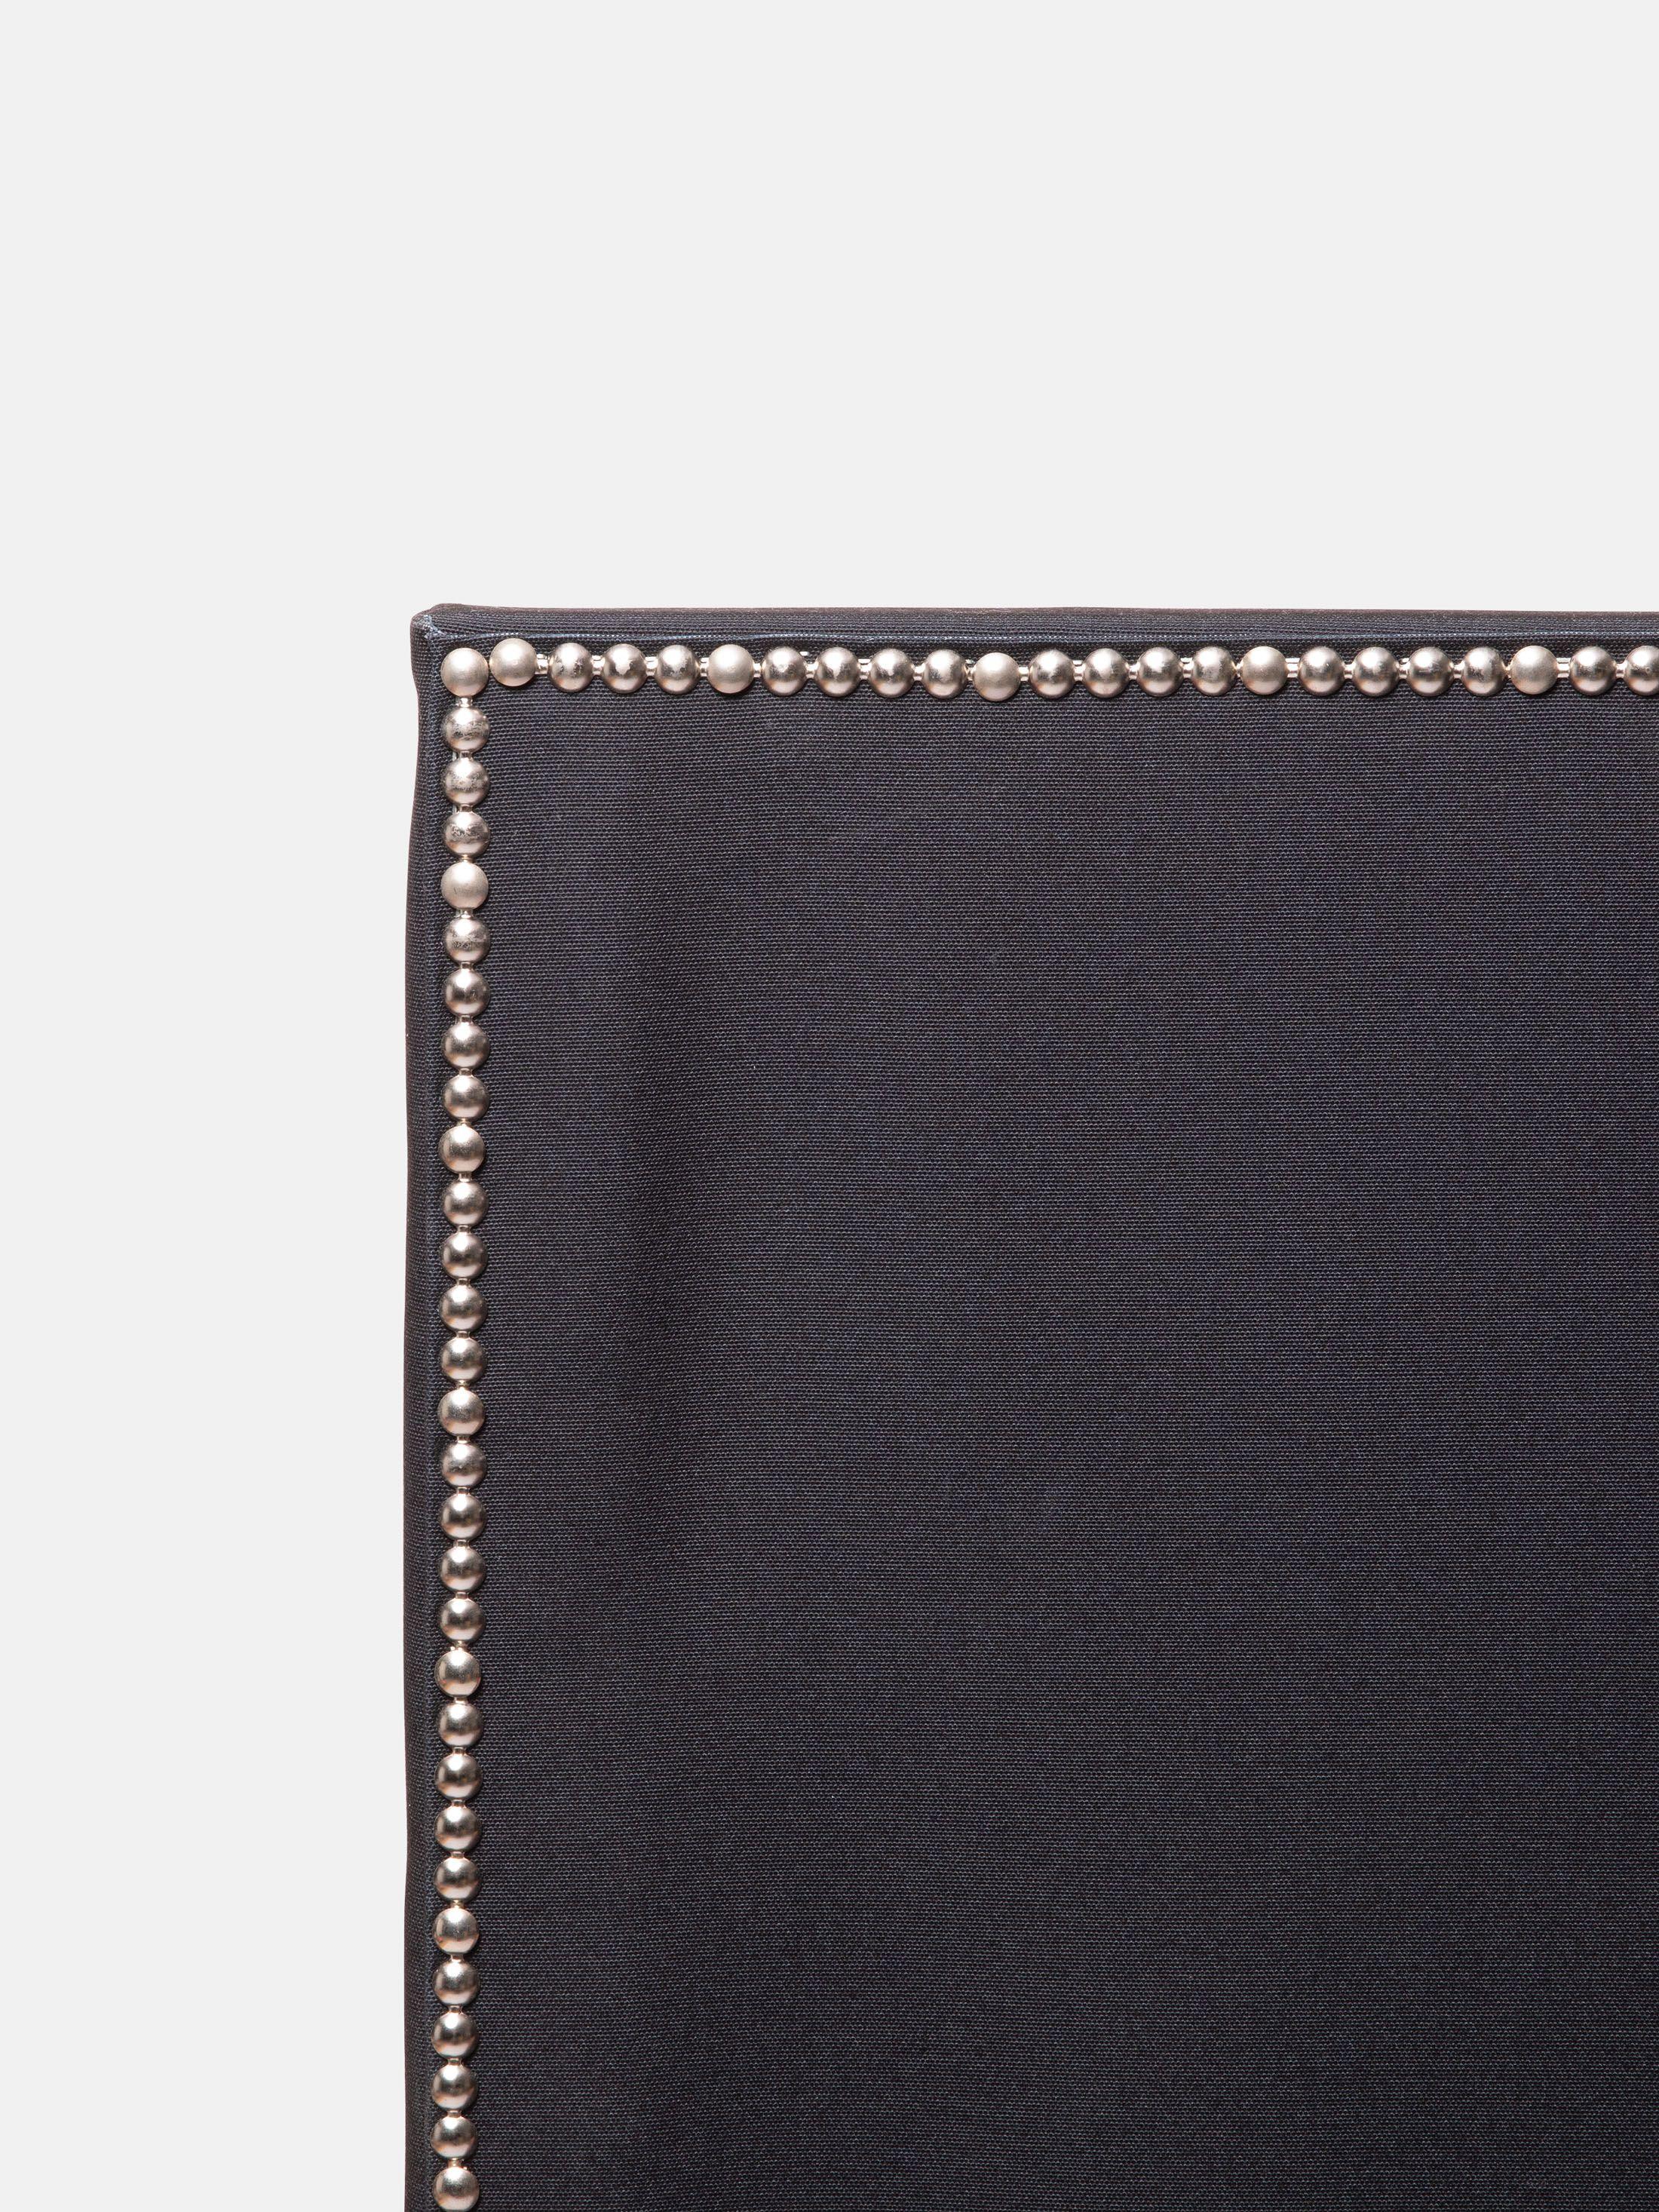 studded reverse of custom folding screen